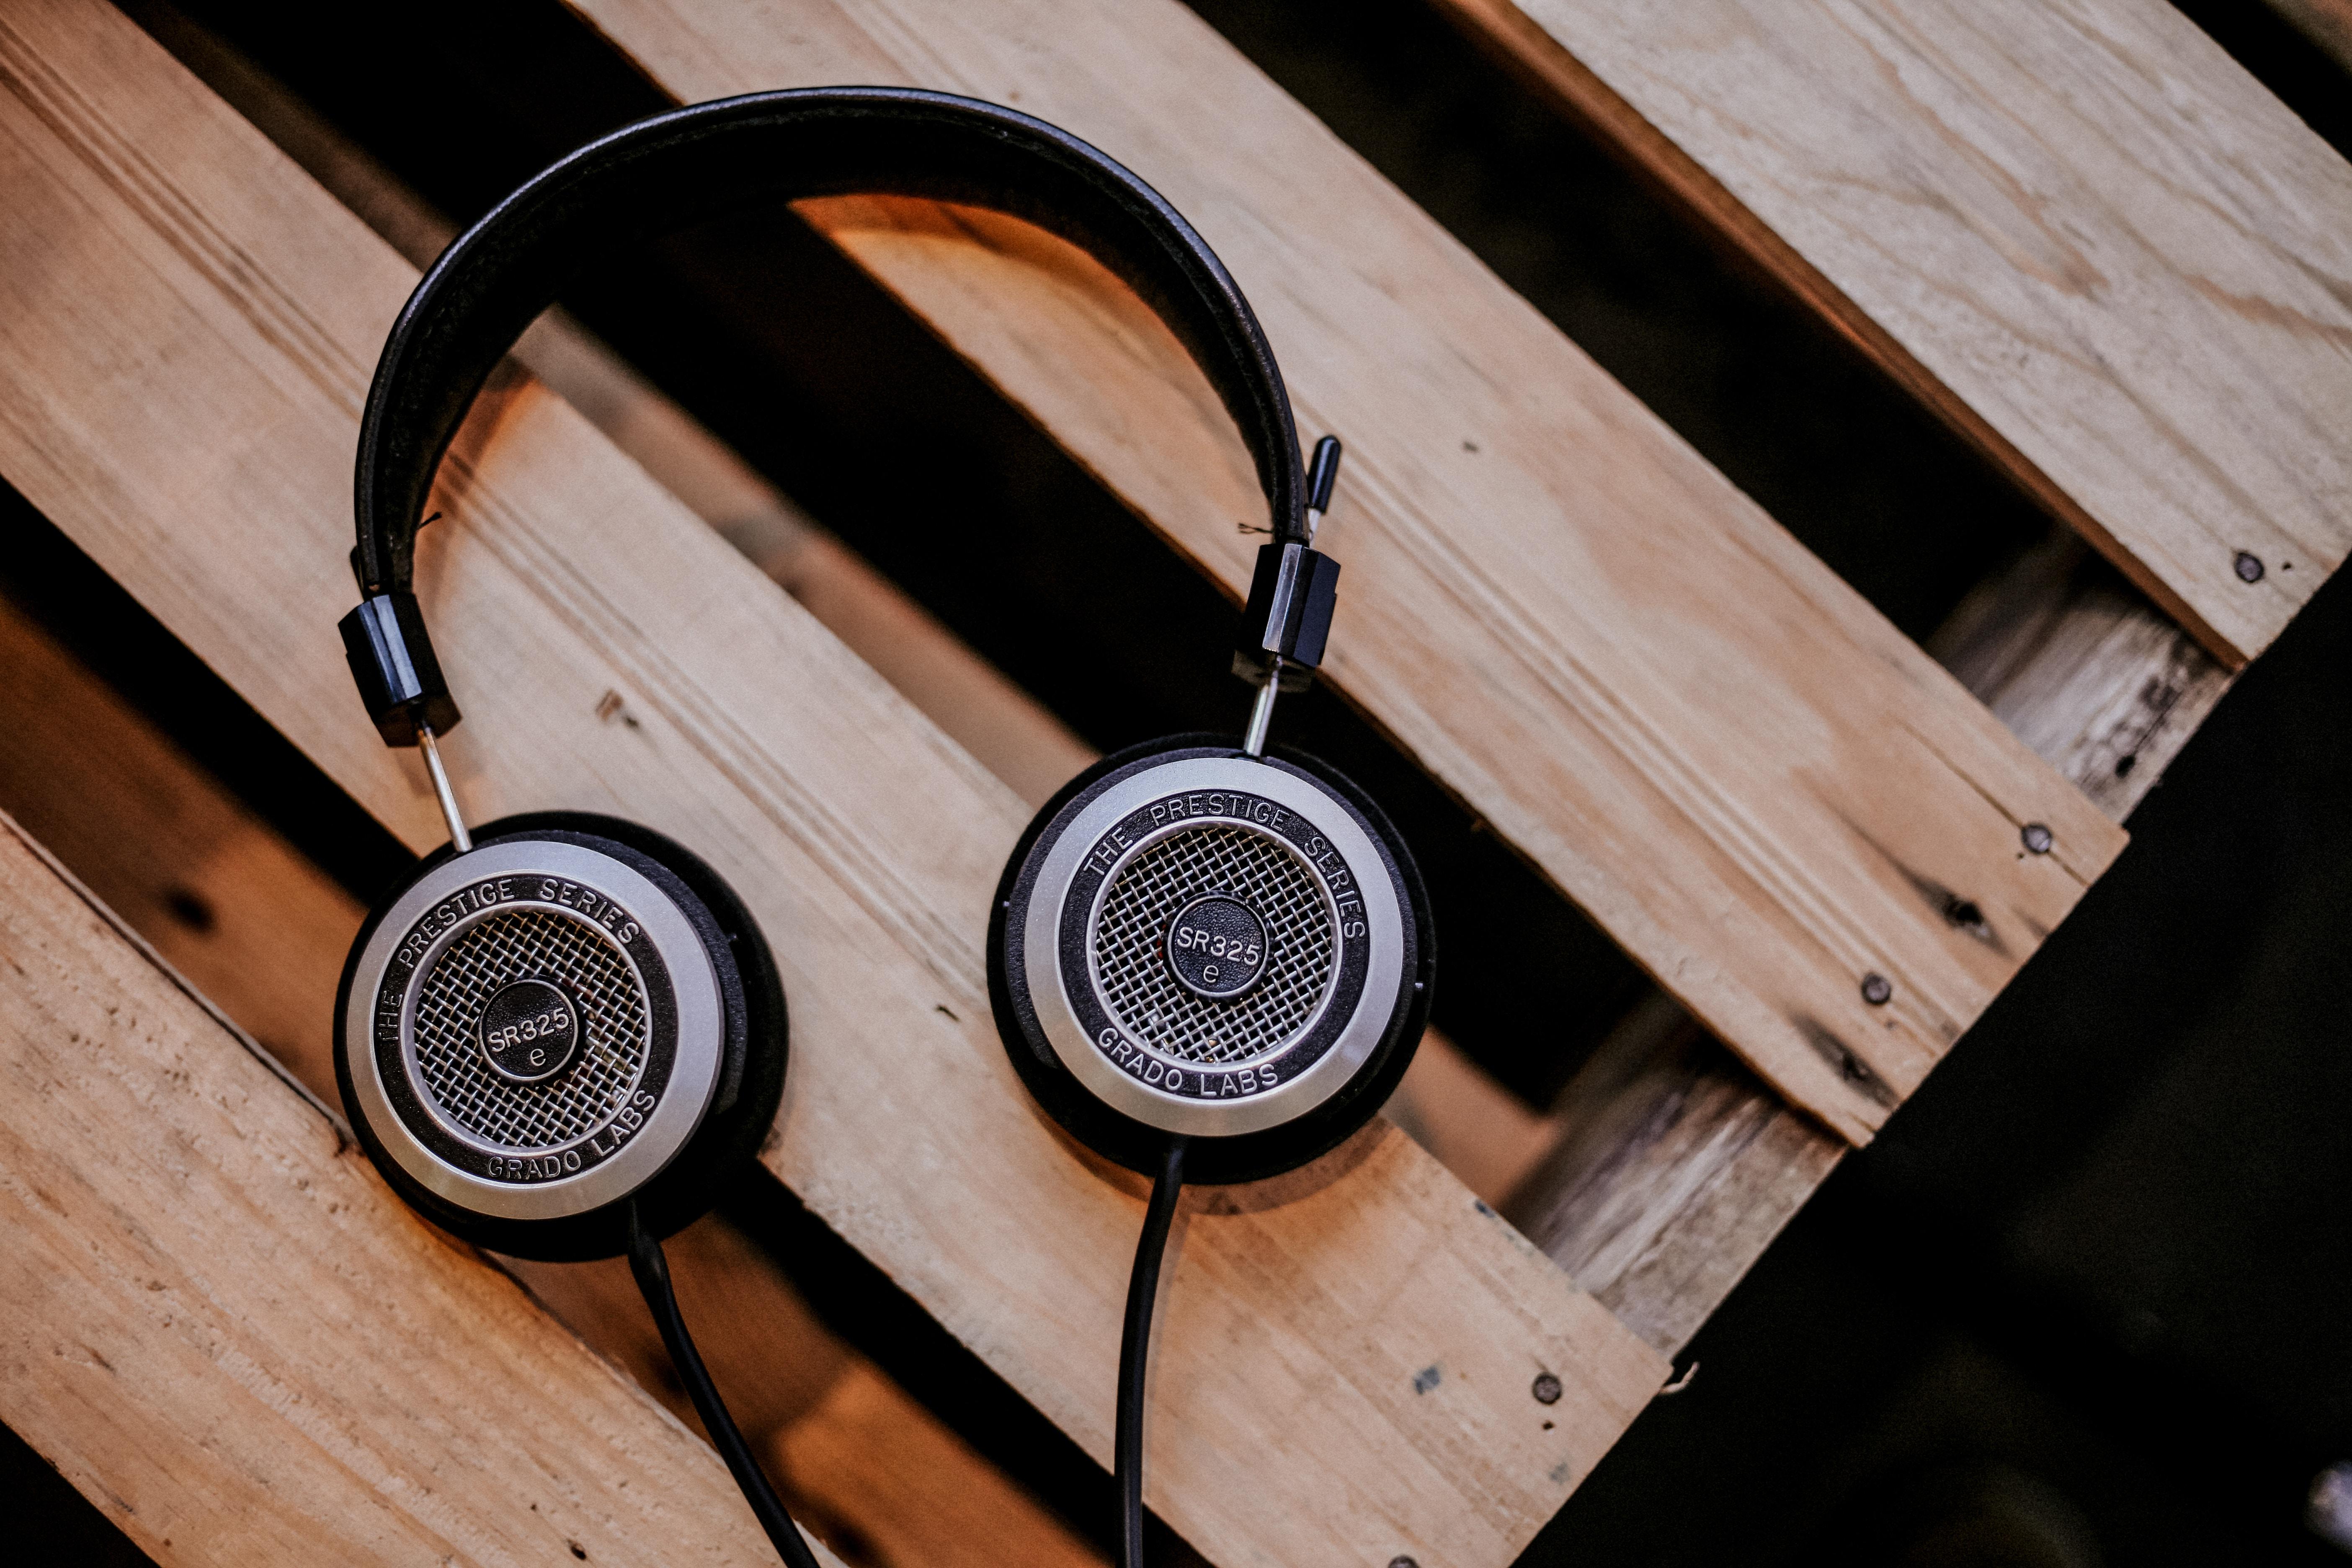 Black headphones on wooden slatted table